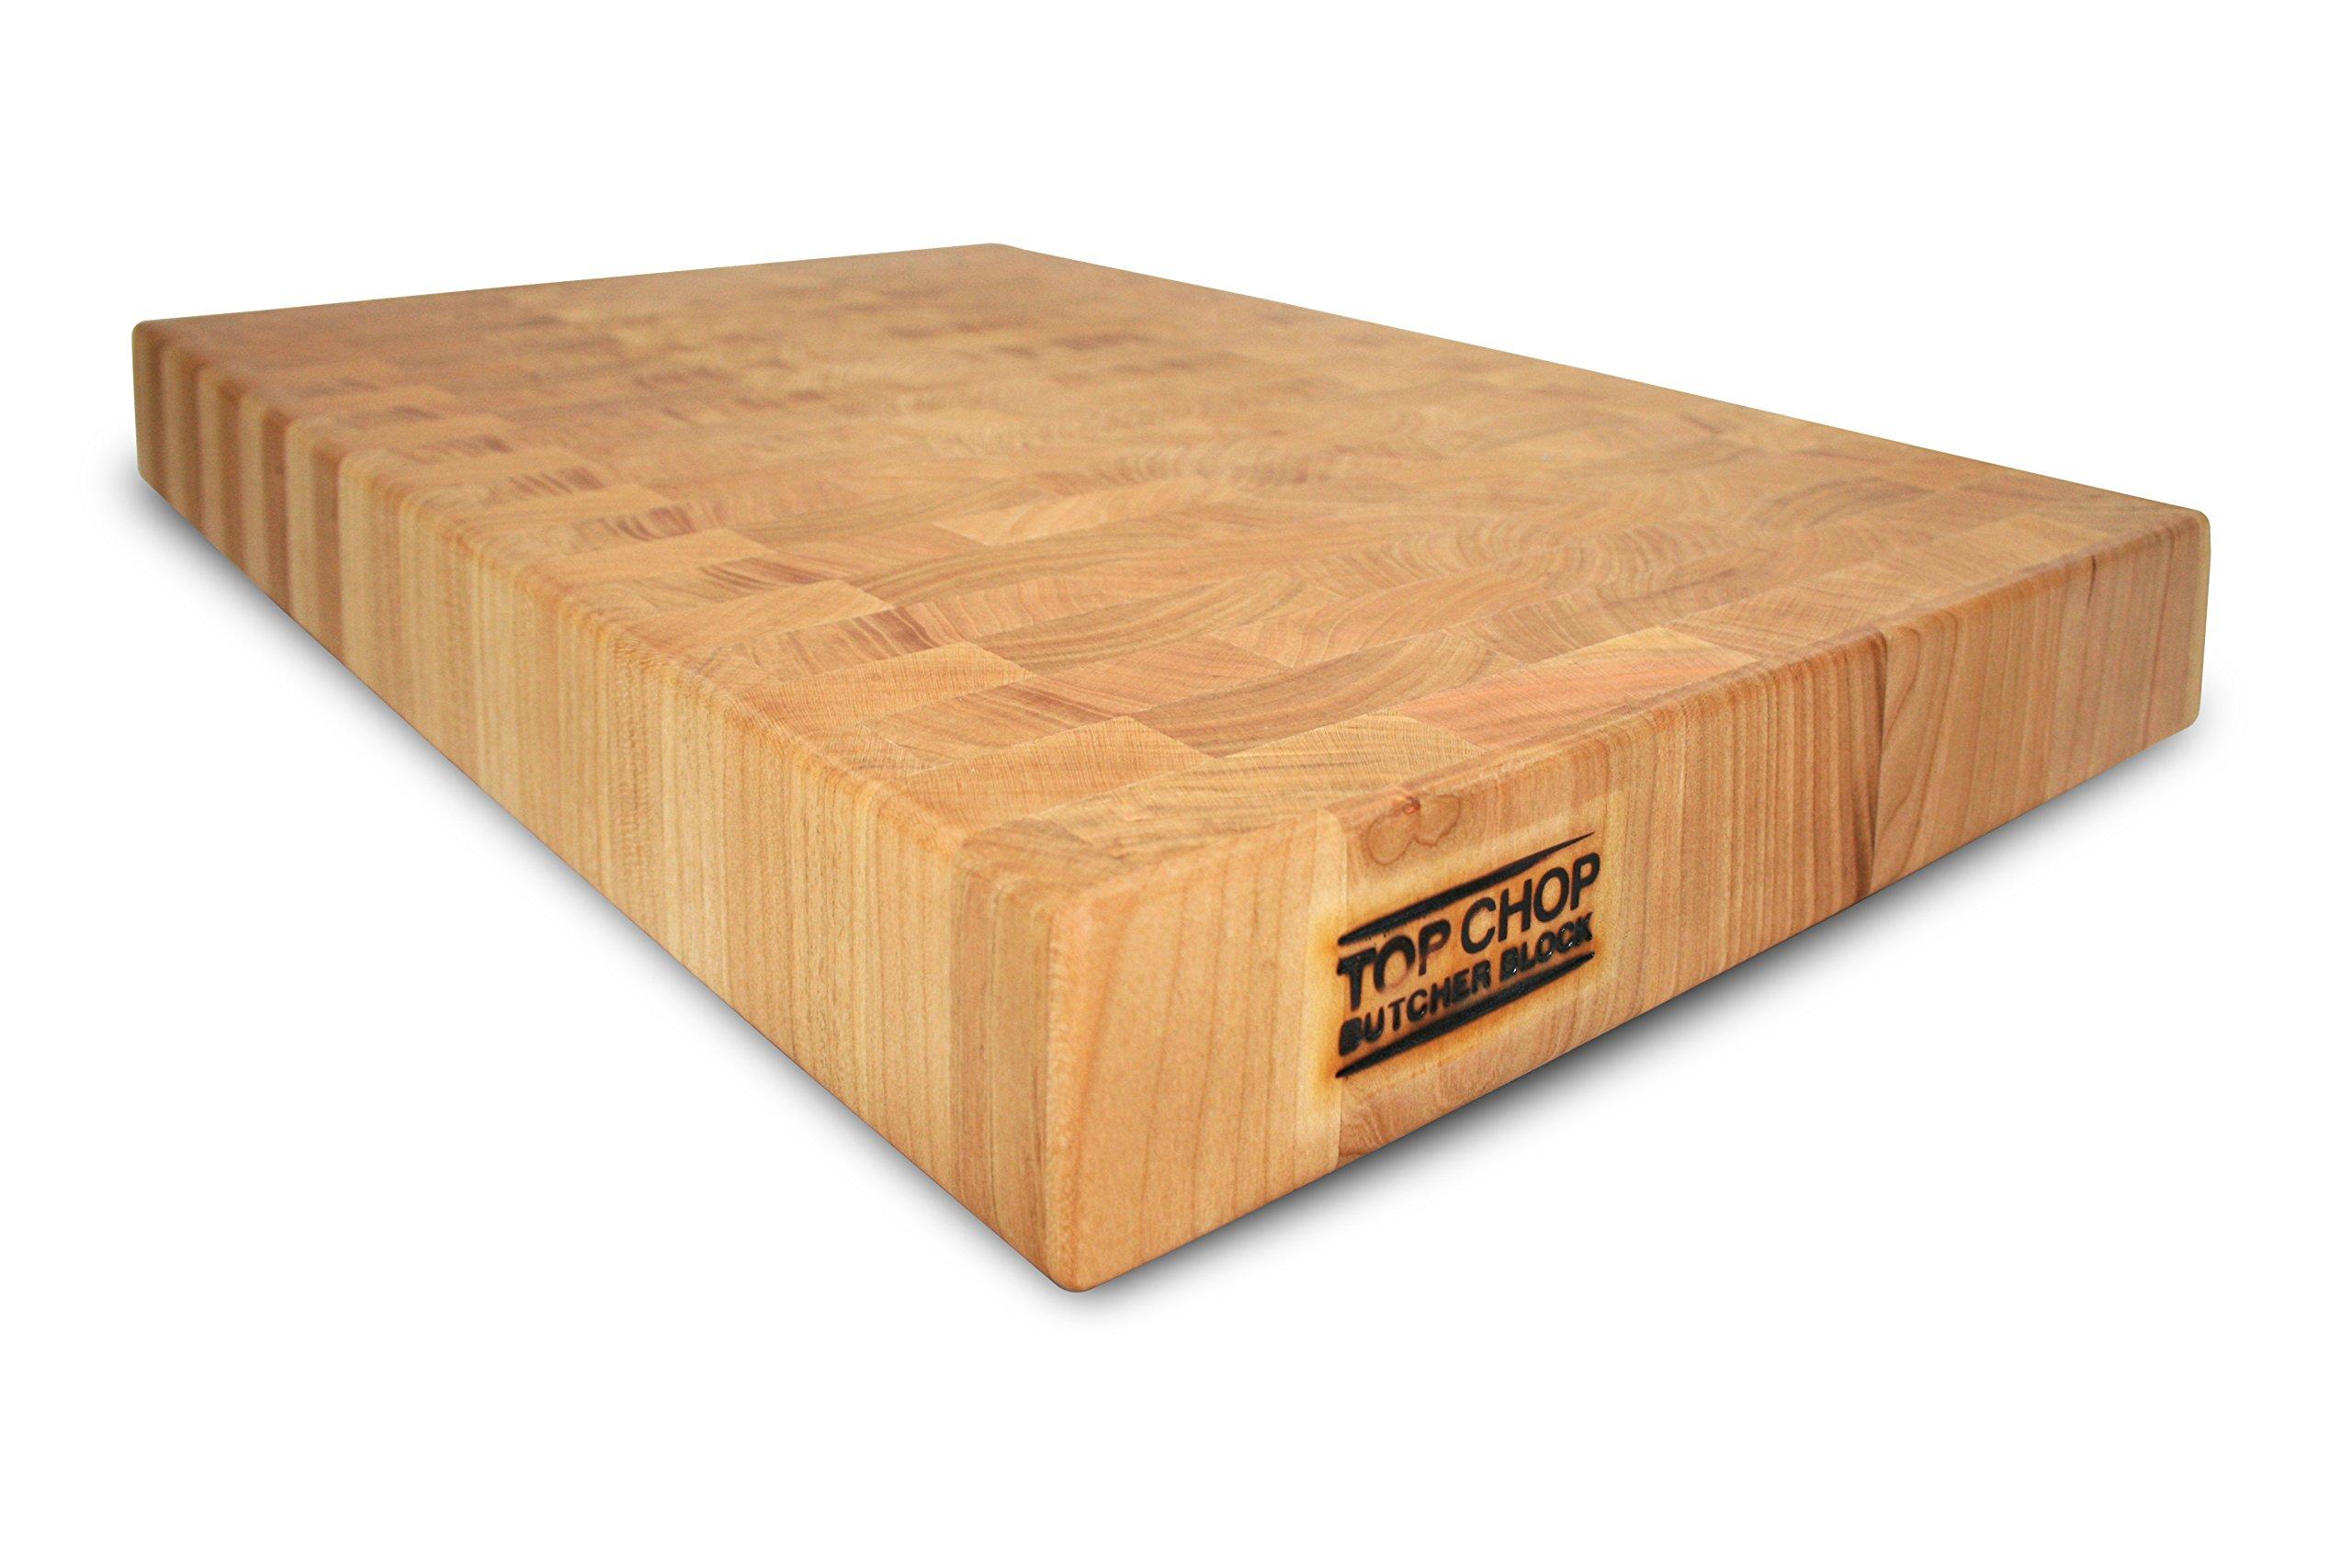 Top Chop Butcher Block Premium Reversible End Grain Cutting Board, Cherry, 12'' x 18'' x 2'' by Top Chop Butcher Block